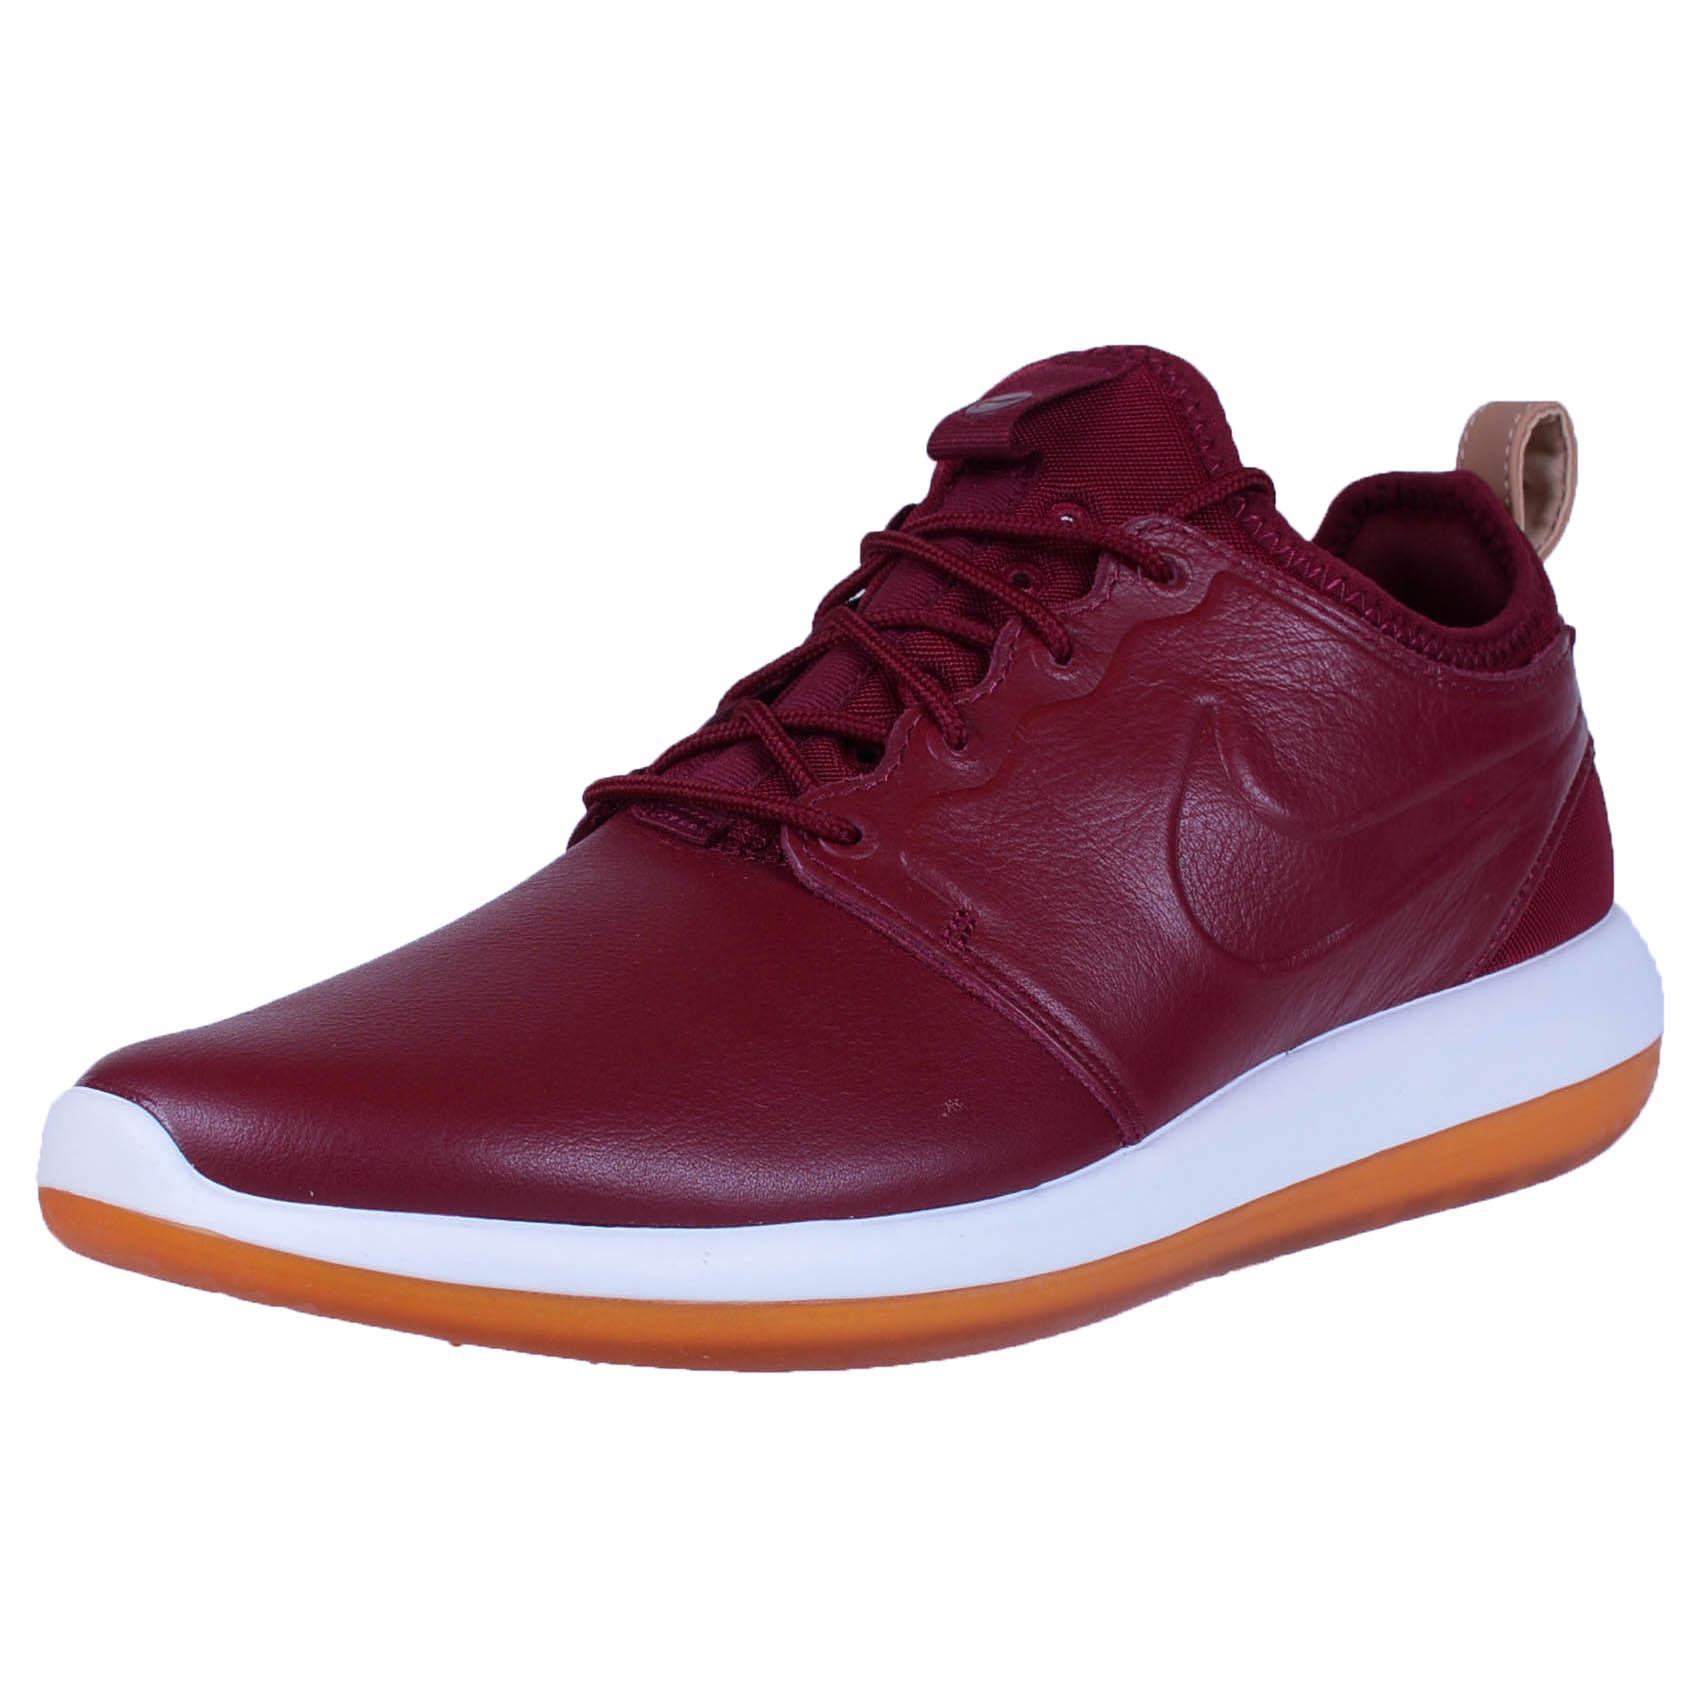 3e724cc79d151 2016 Limited Hombre Nike Air Force 1  Q7 Low Leather Todos De Red ...